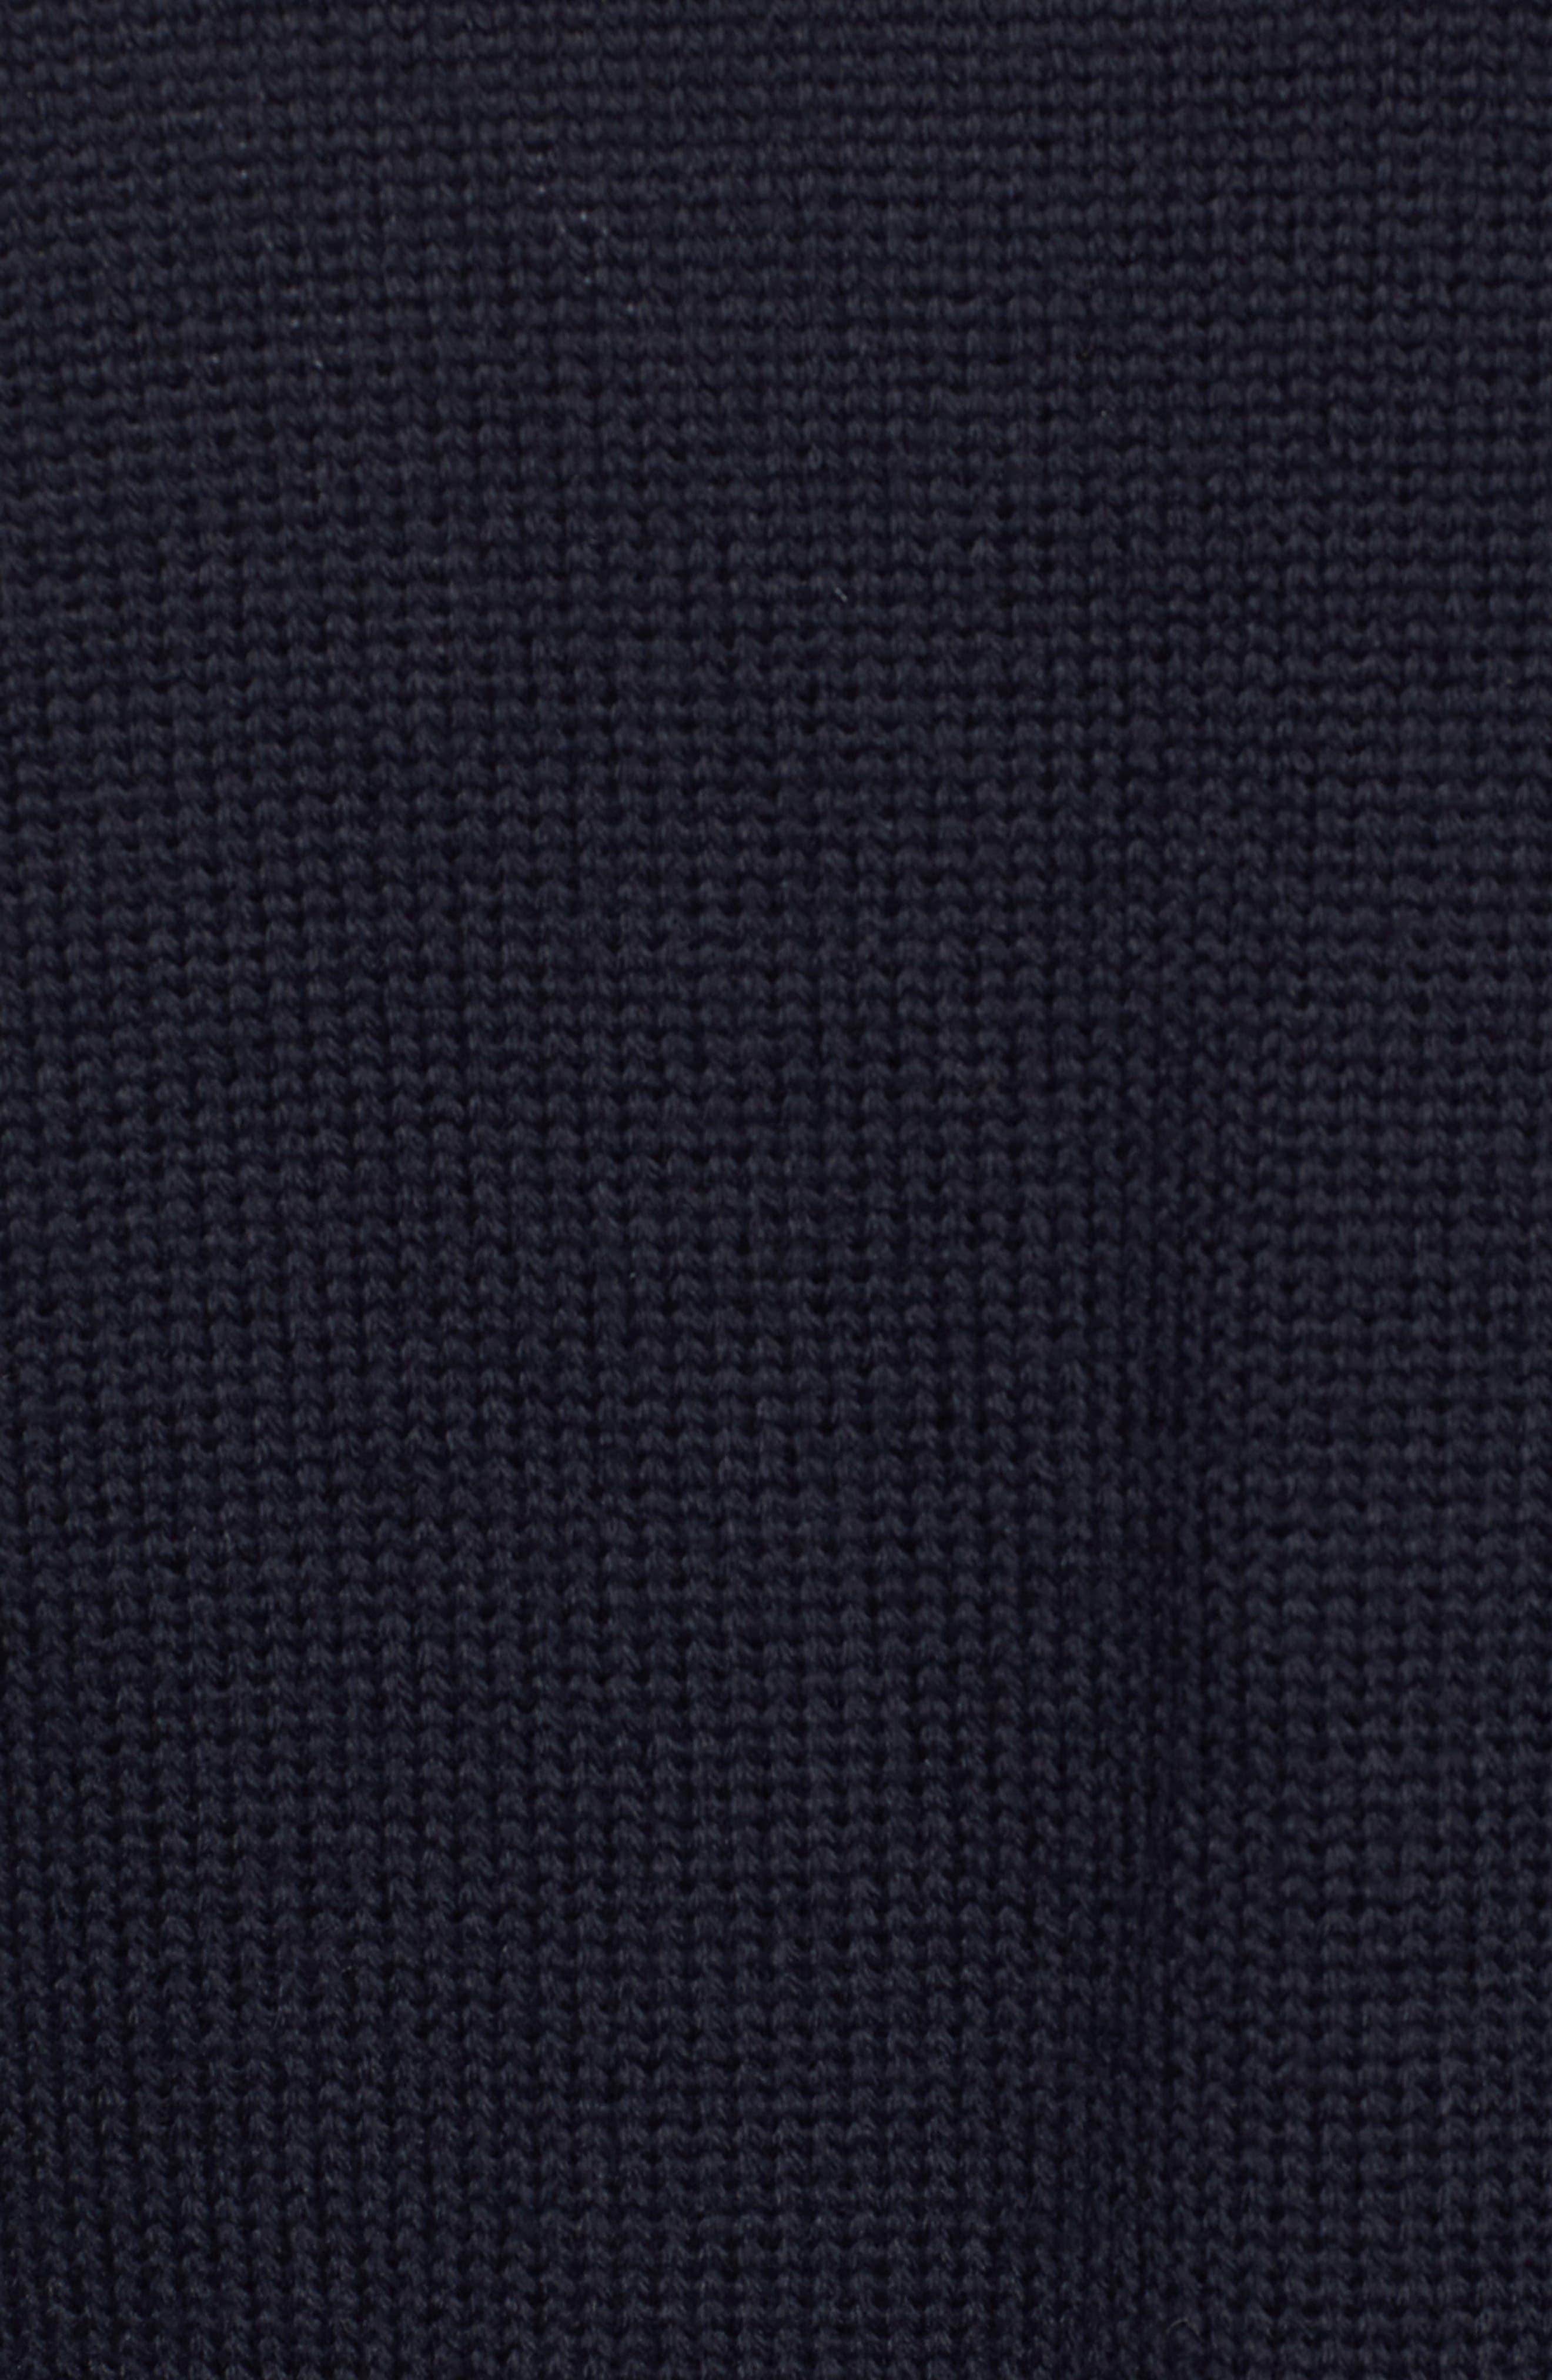 Wool Cardigan with Bib,                             Alternate thumbnail 5, color,                             Navy Night